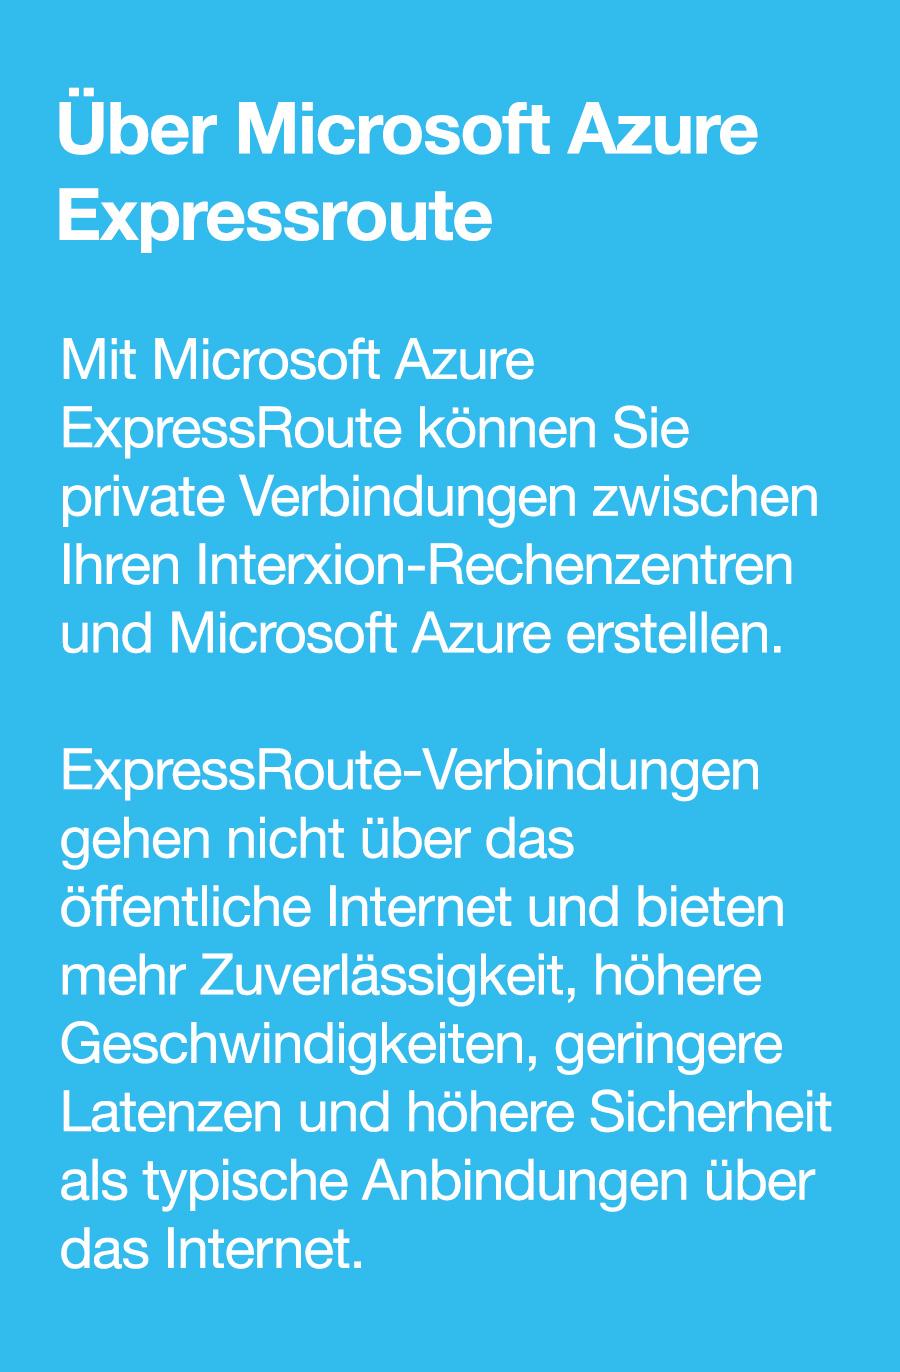 Über Microsoft Azure